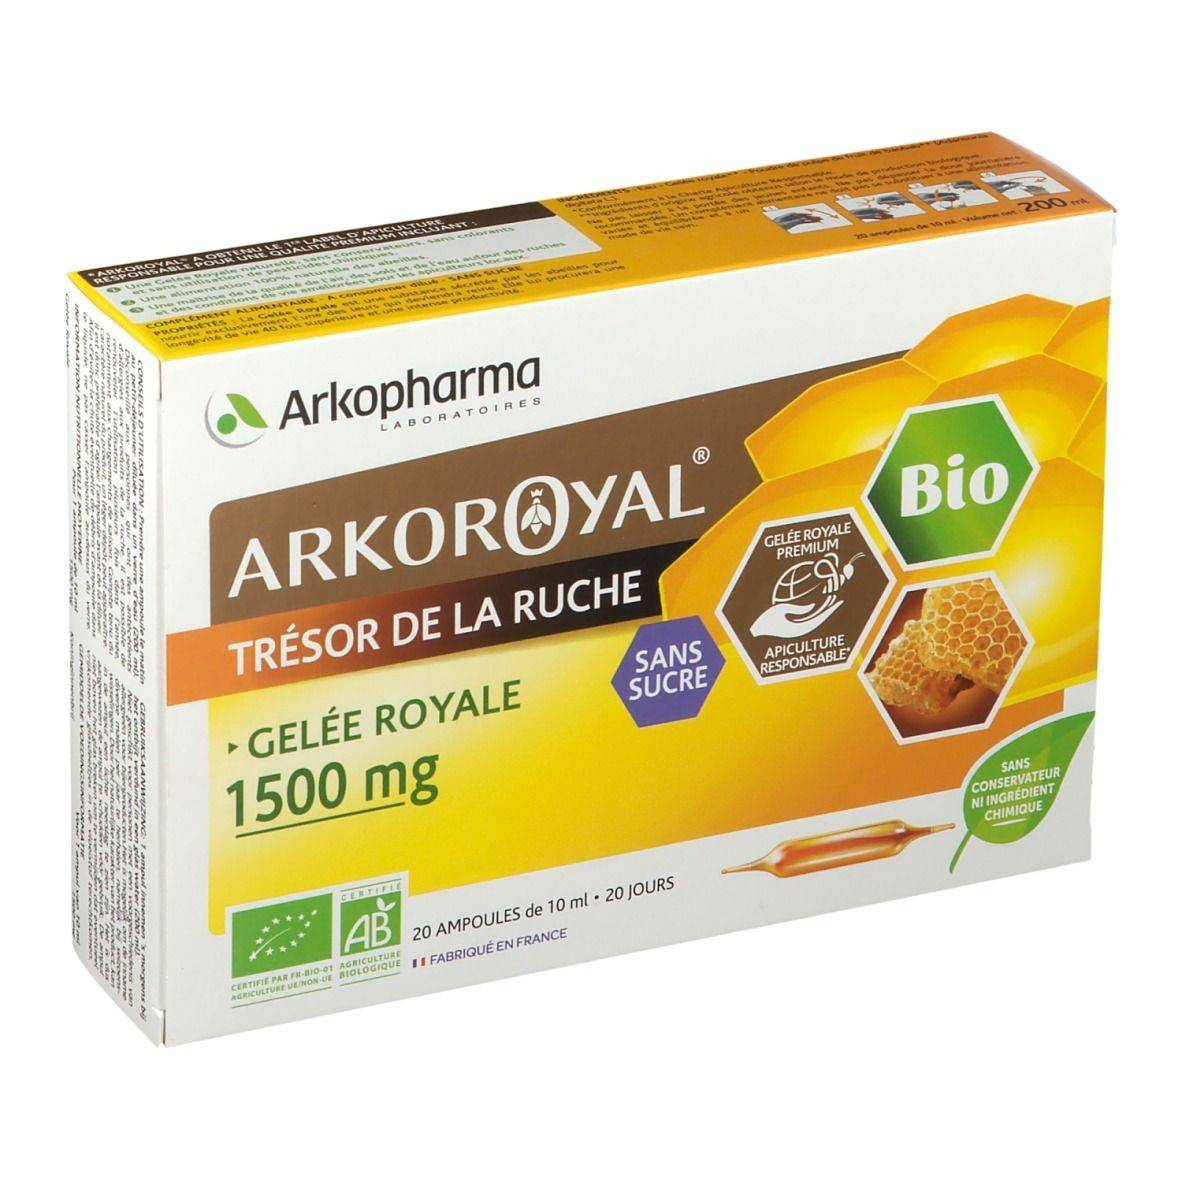 Arkoroyal® Arkopharma ARKOROYAL® Gelée Royale BIO sans sucre ml ampoule(s)